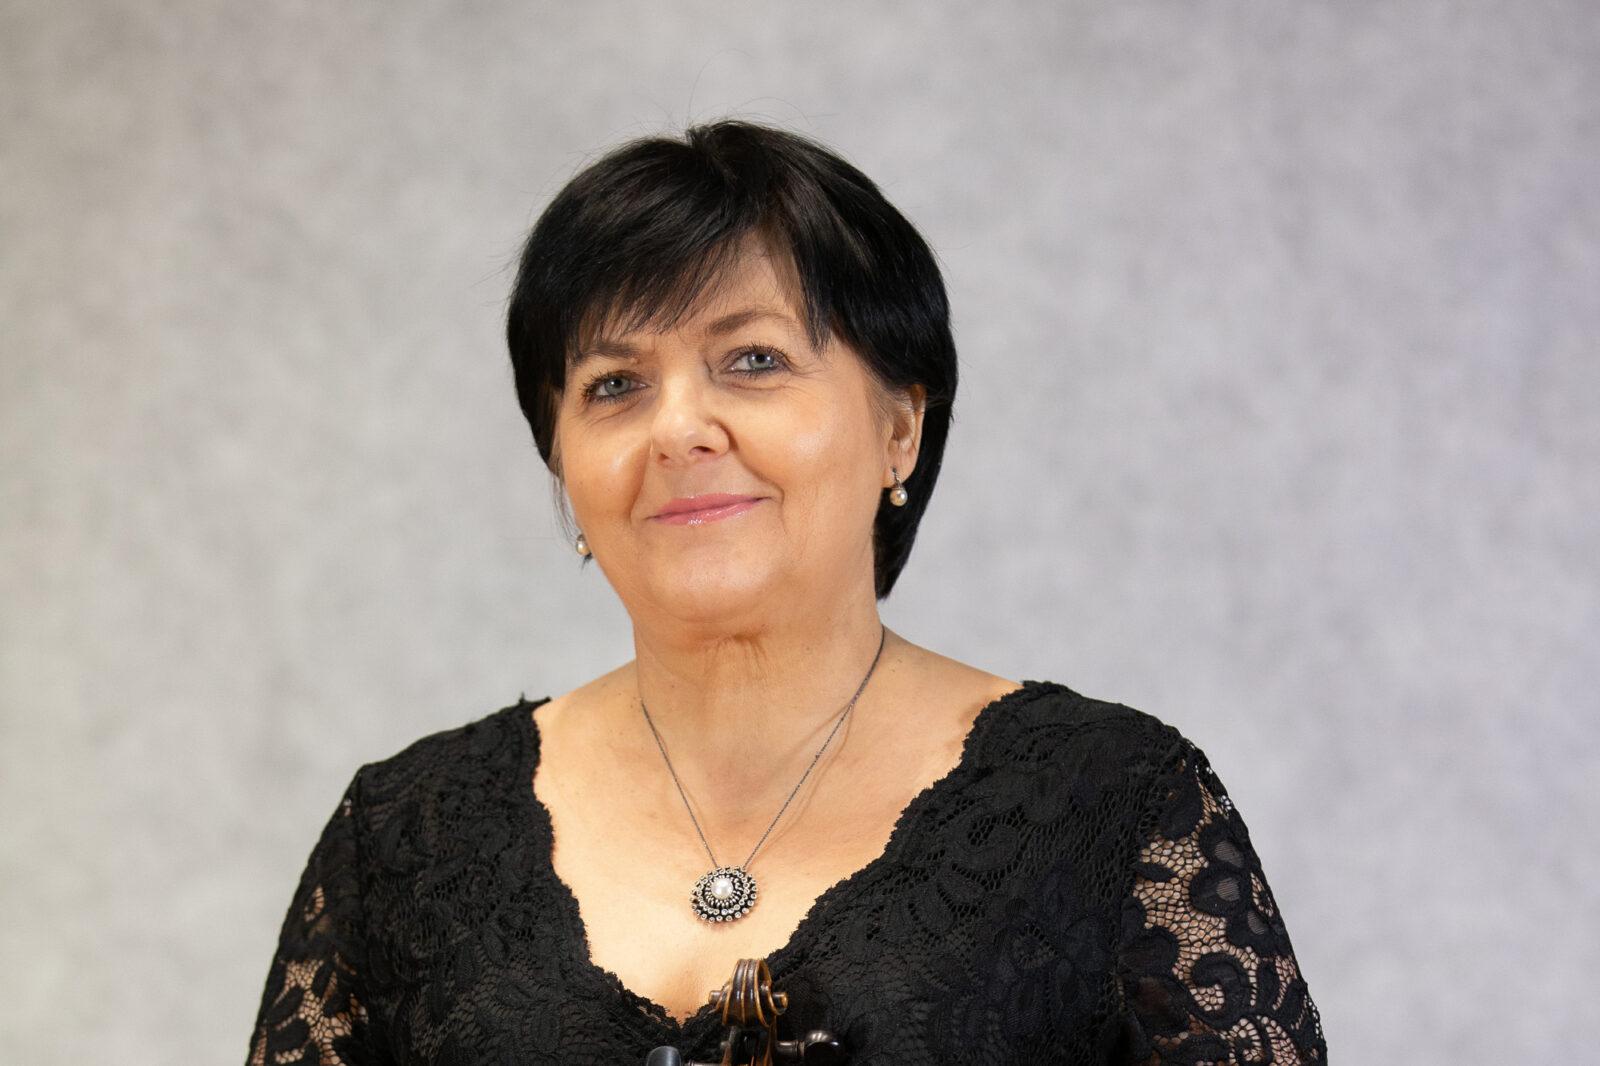 Jolanta Nowosadzka